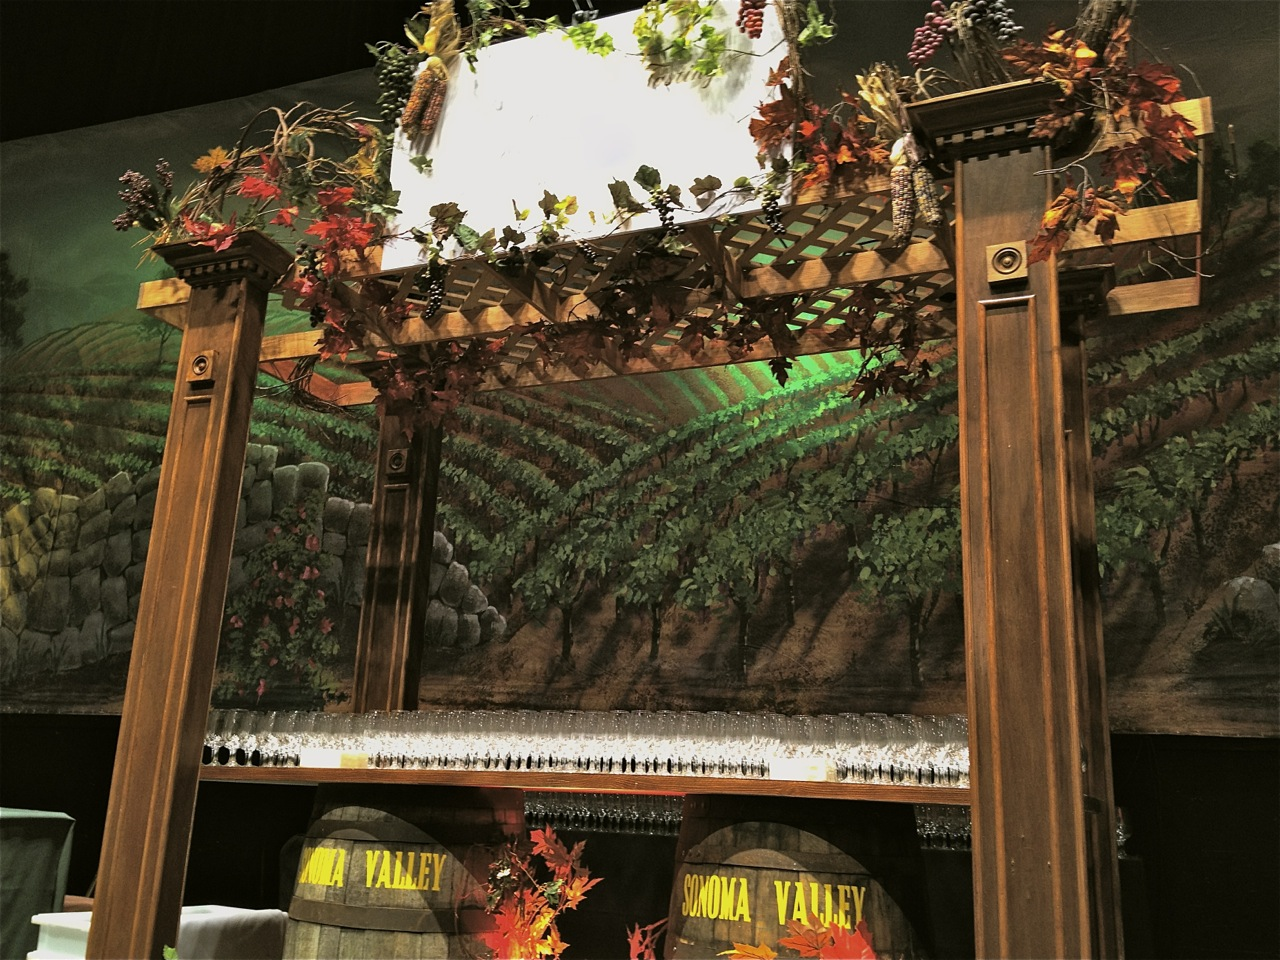 Bar+Rental+NJ+NYC+Eggsotic+Events+Wine+Bar+Sonoma+Valley+Theme+Autumn+Theme++1.jpg